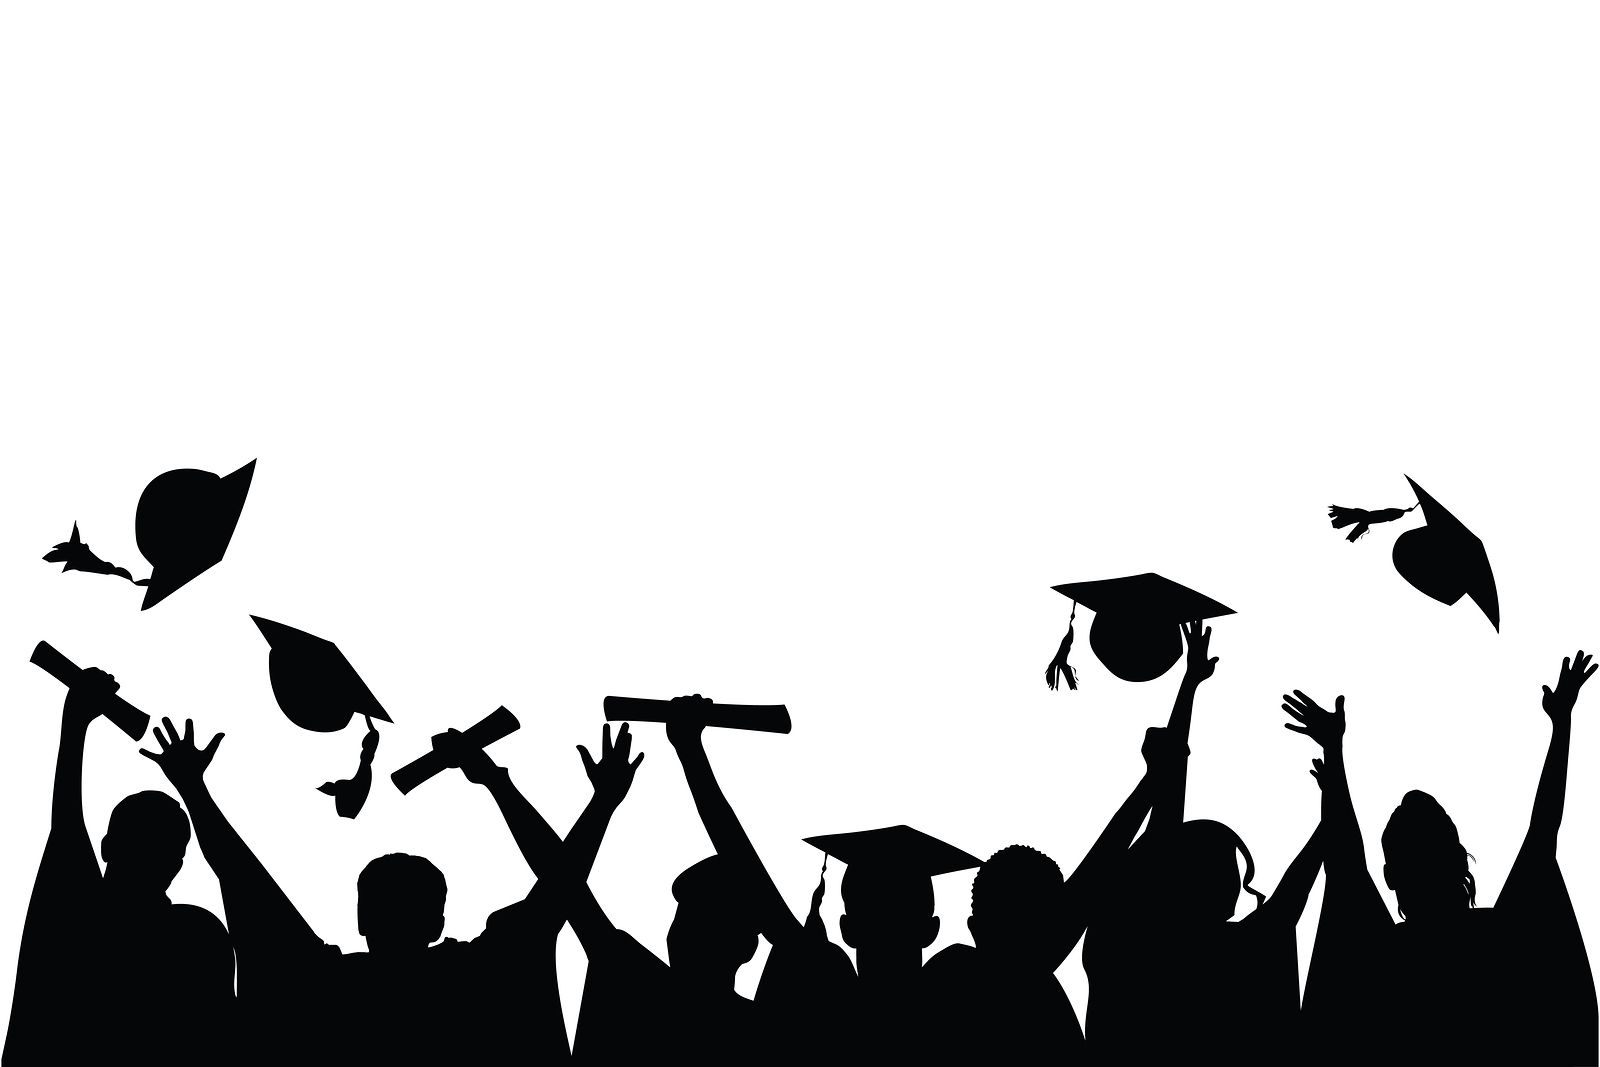 Graduation Silhouette Png